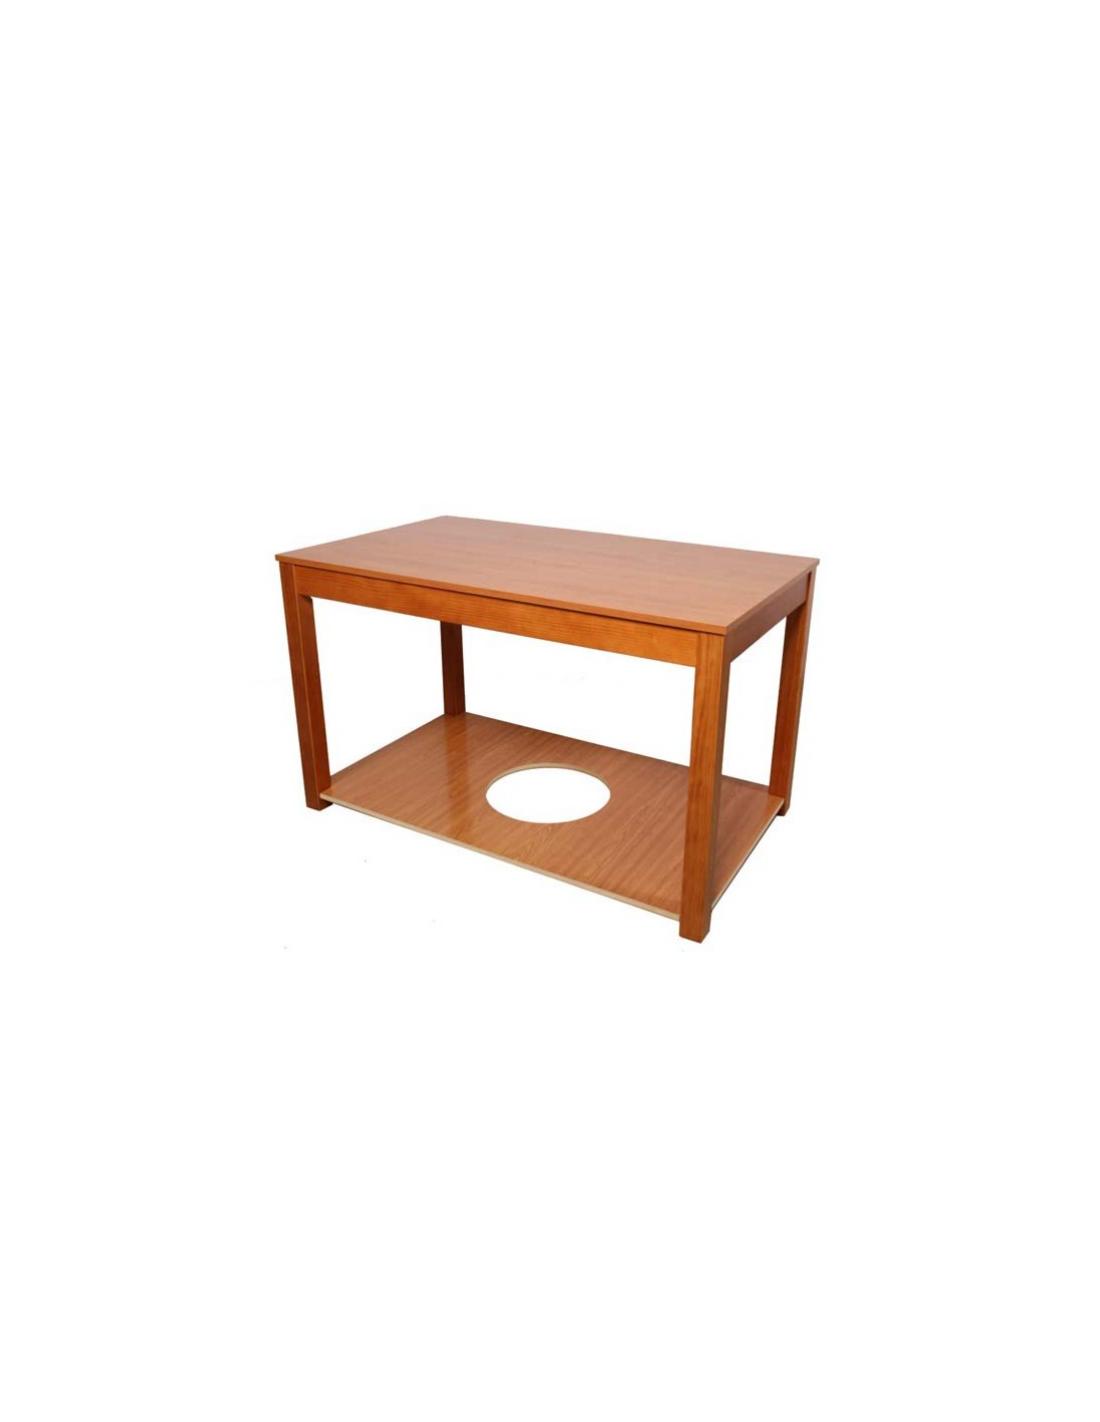 Chaise-longues  2 plazas reclinable y extraíble tela antimanchas 225 cm